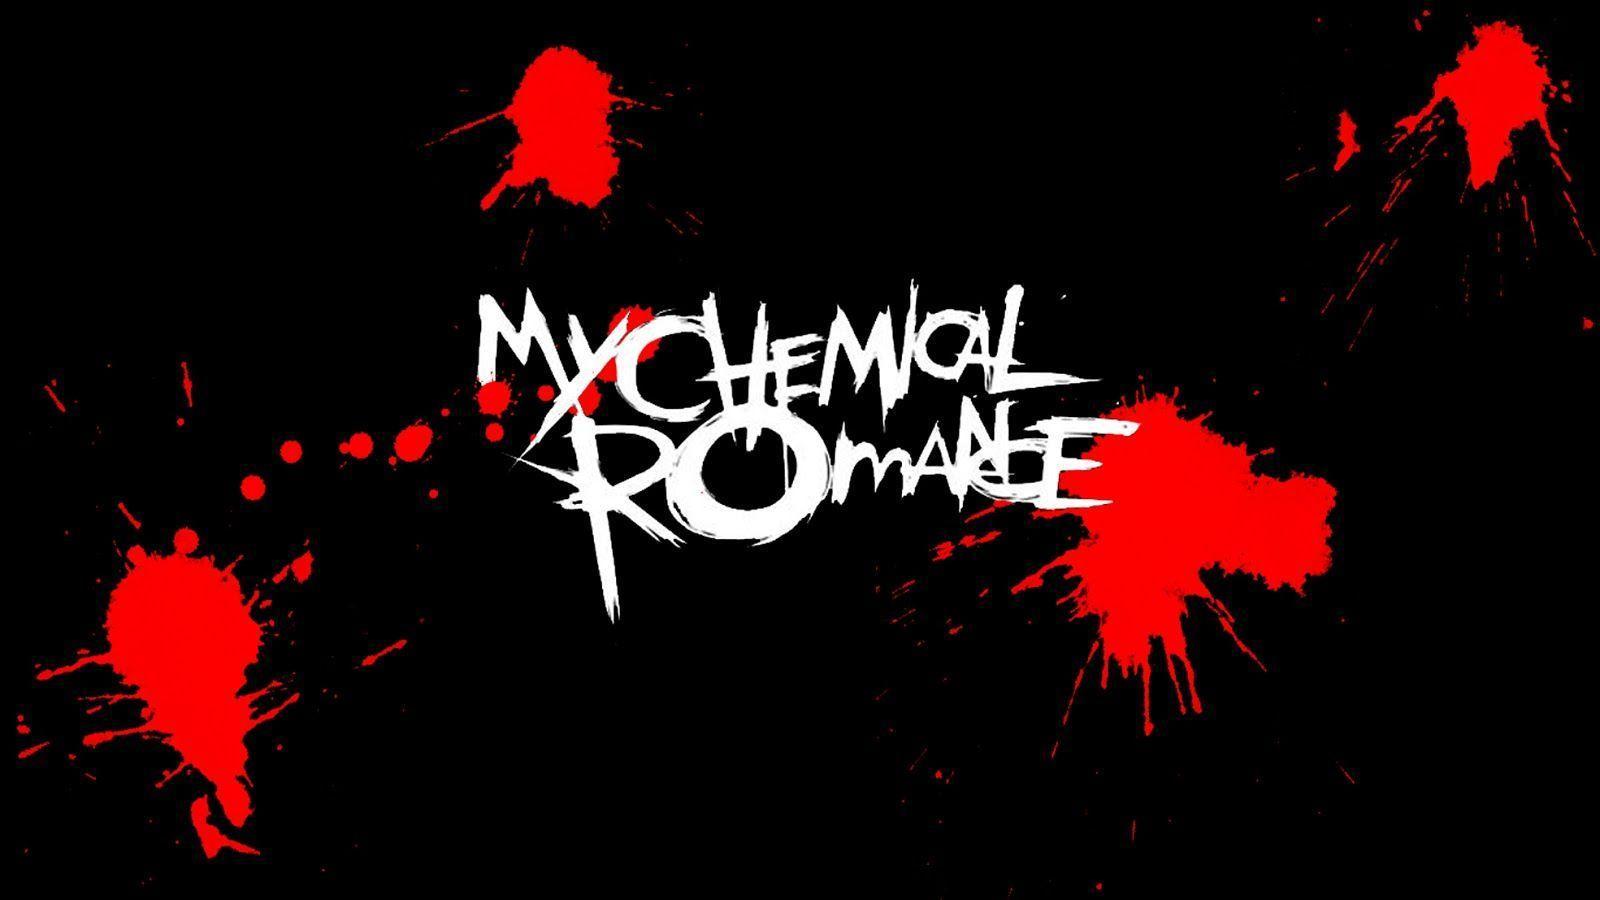 Mcr iphone wallpaper tumblr - My Chemical Romance Iphone Wallpaper 69530 Wallpaper Wallpapersstar